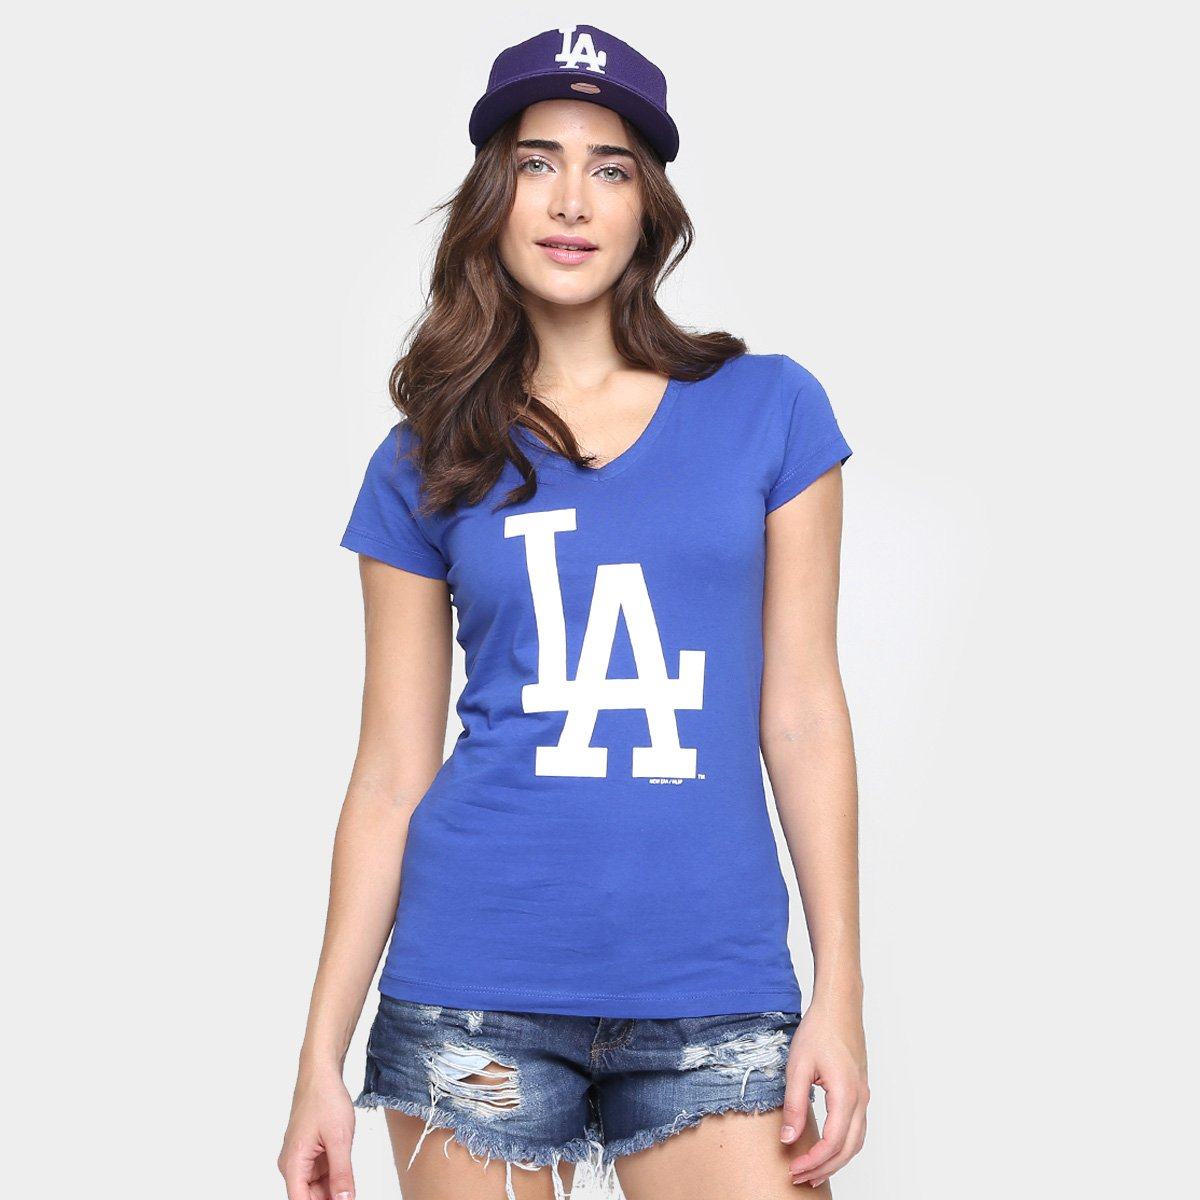 Camiseta New Era MLB Babby Look Los Angeles Dodgers Feminina - Azul Royal -  Compre Agora  2cddc1f9c90